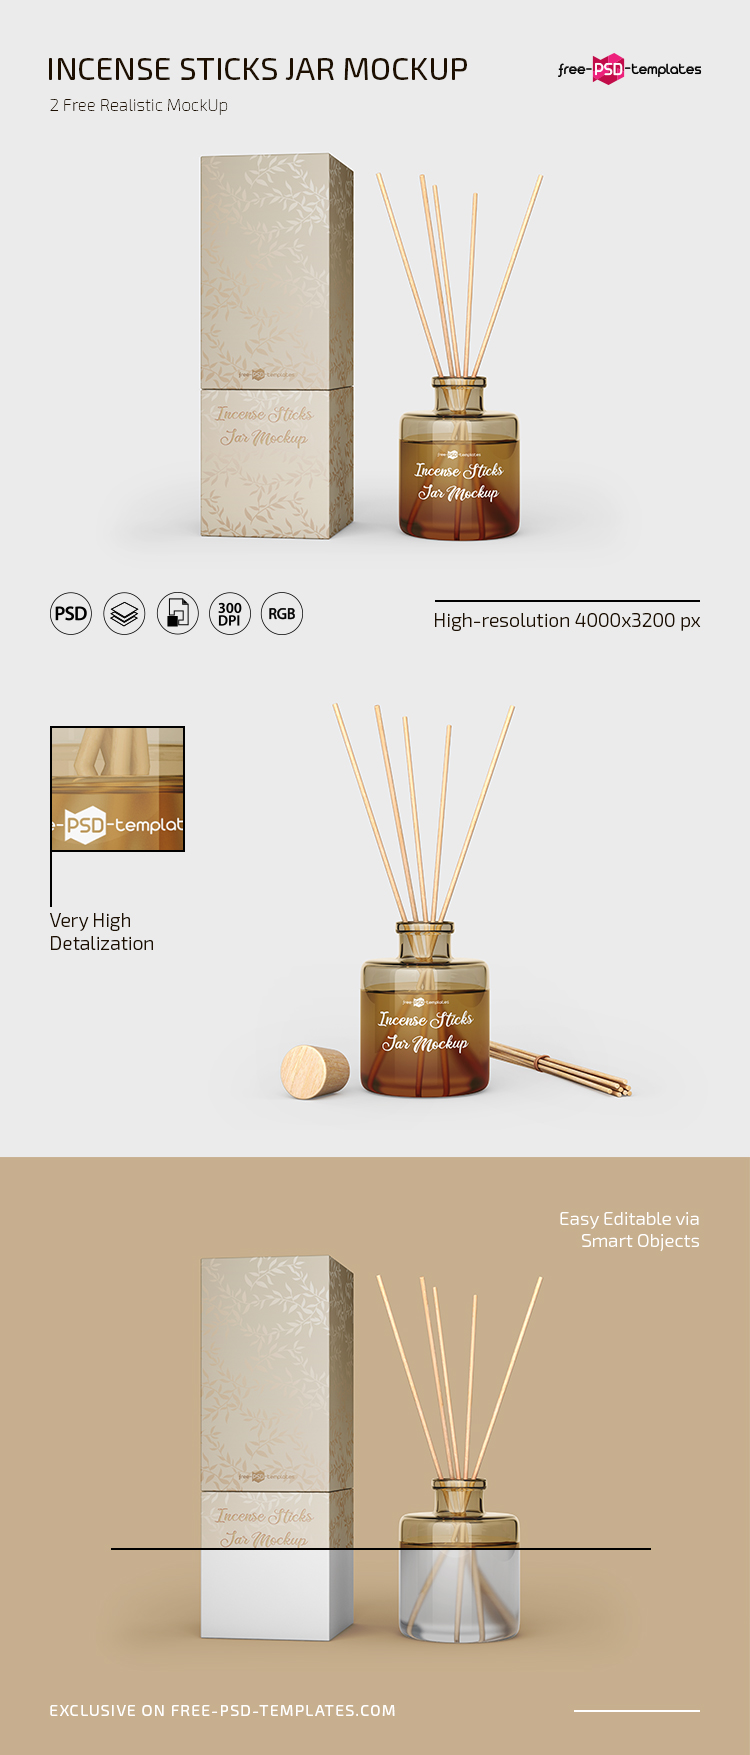 Free Incense Sticks Jar Mockup In Psd Free Psd Templates